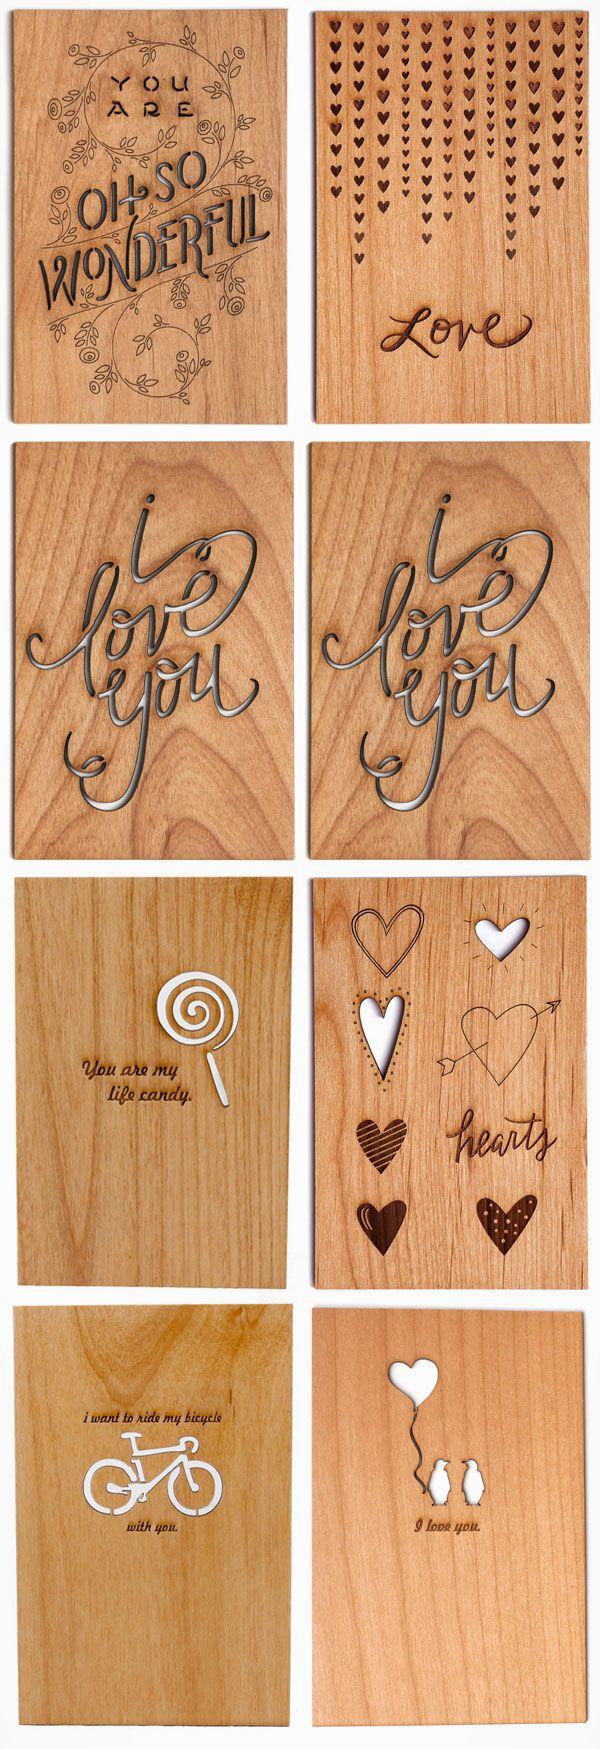 Valentine's day post card design